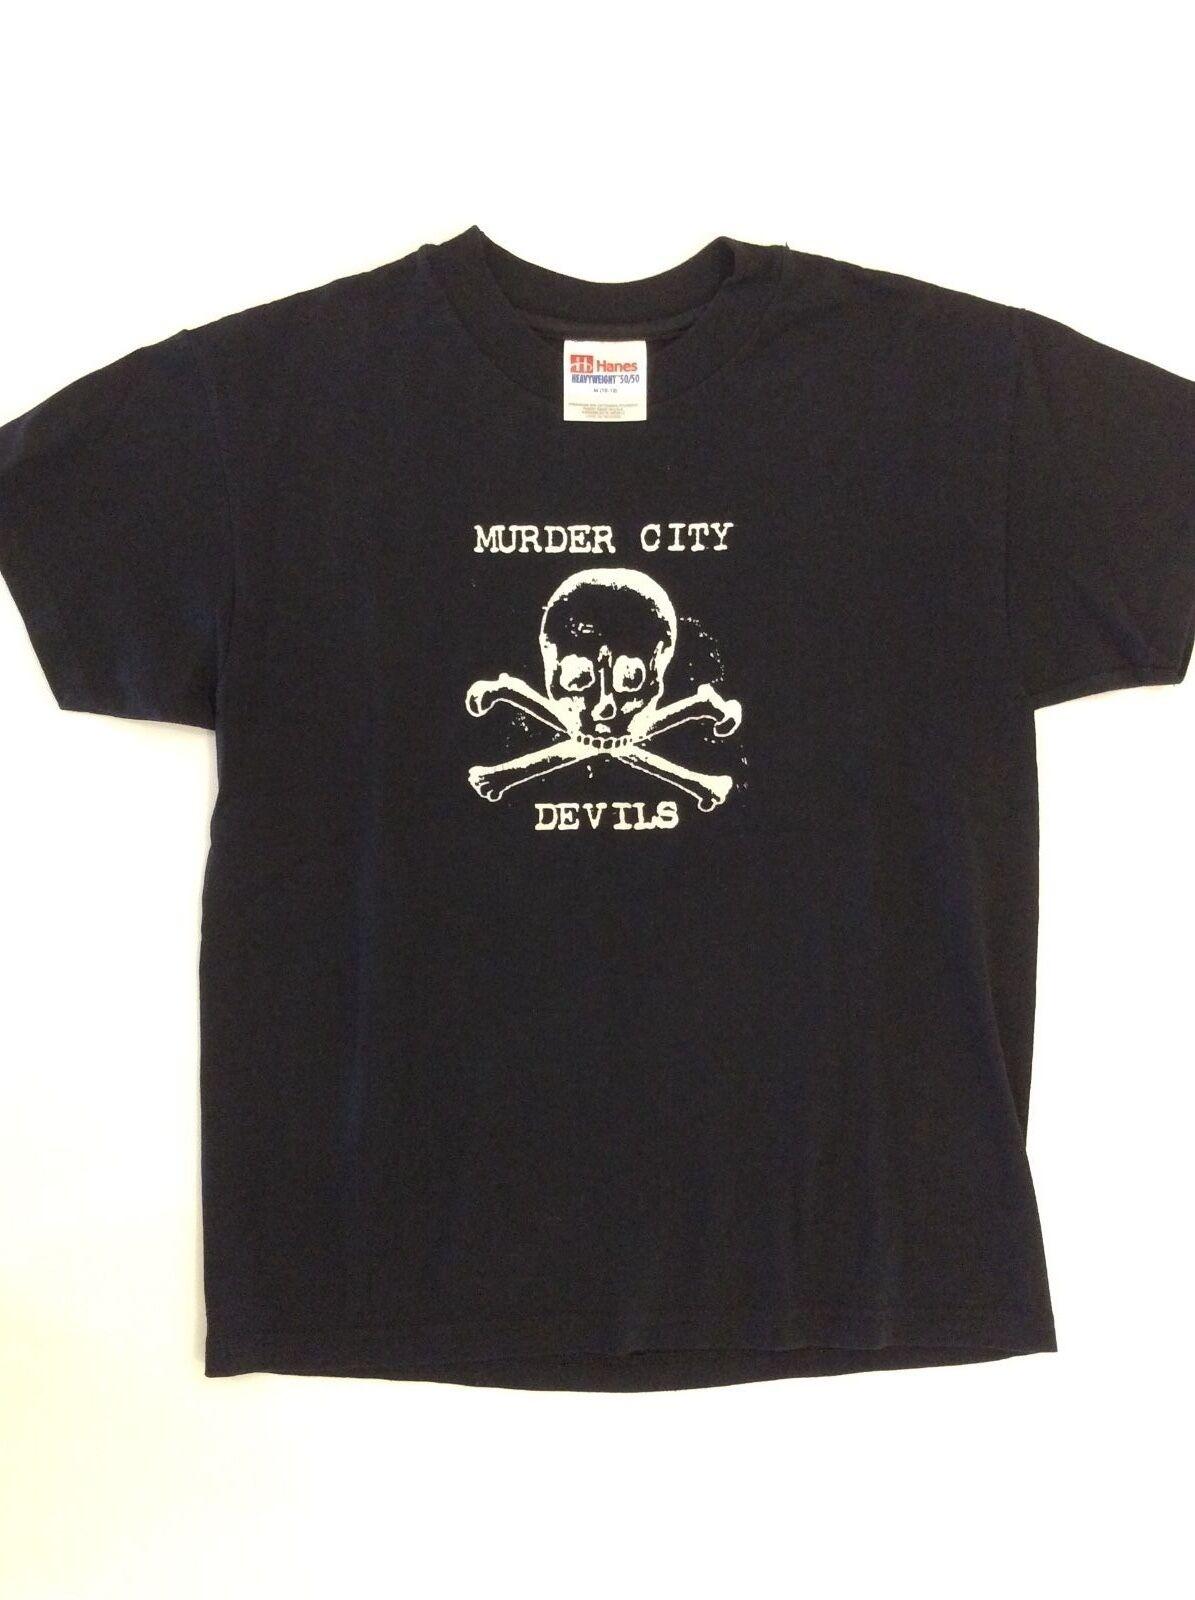 Muder City Devils Skull & Crossbones T-Shirt - schwarz - Woherren Small S